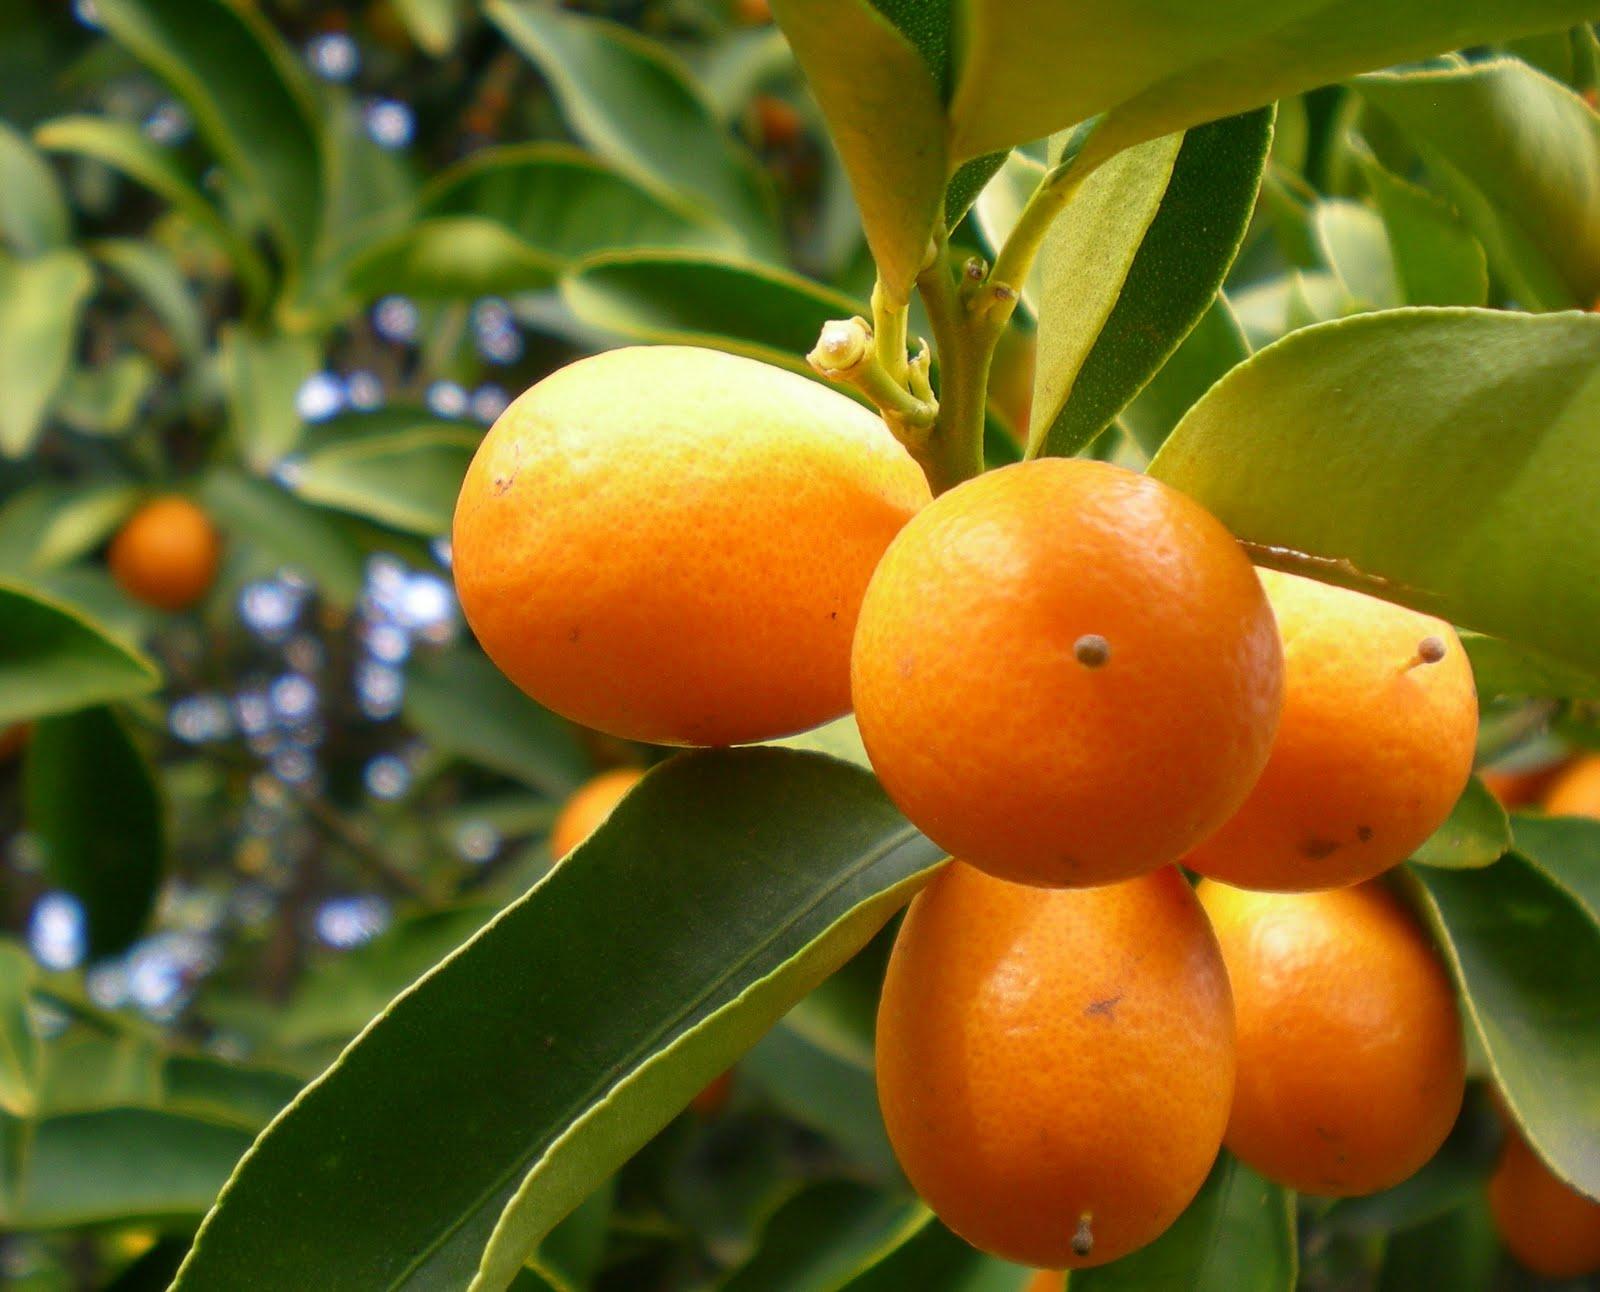 The citrus guy july 2012 for Plante kumquat